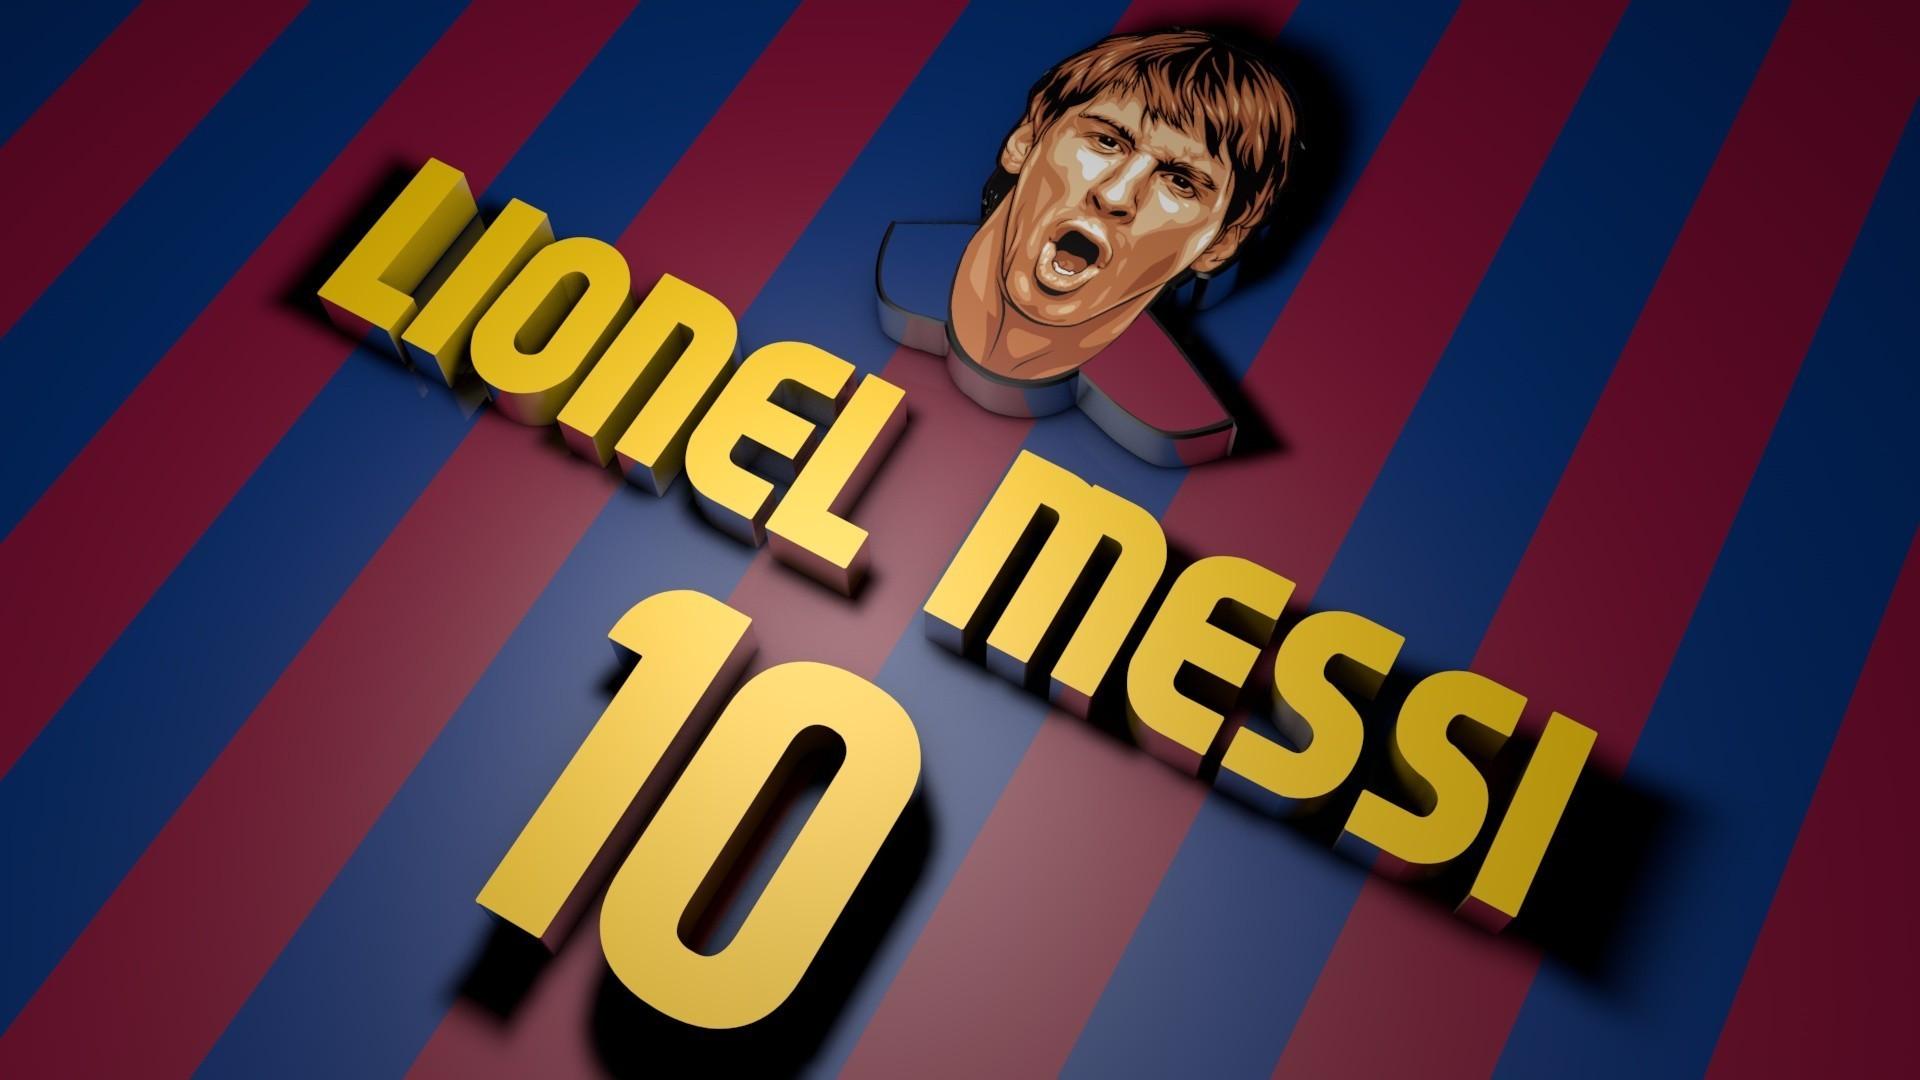 Lionel Messi FC Barcelona HD Wallpaper.